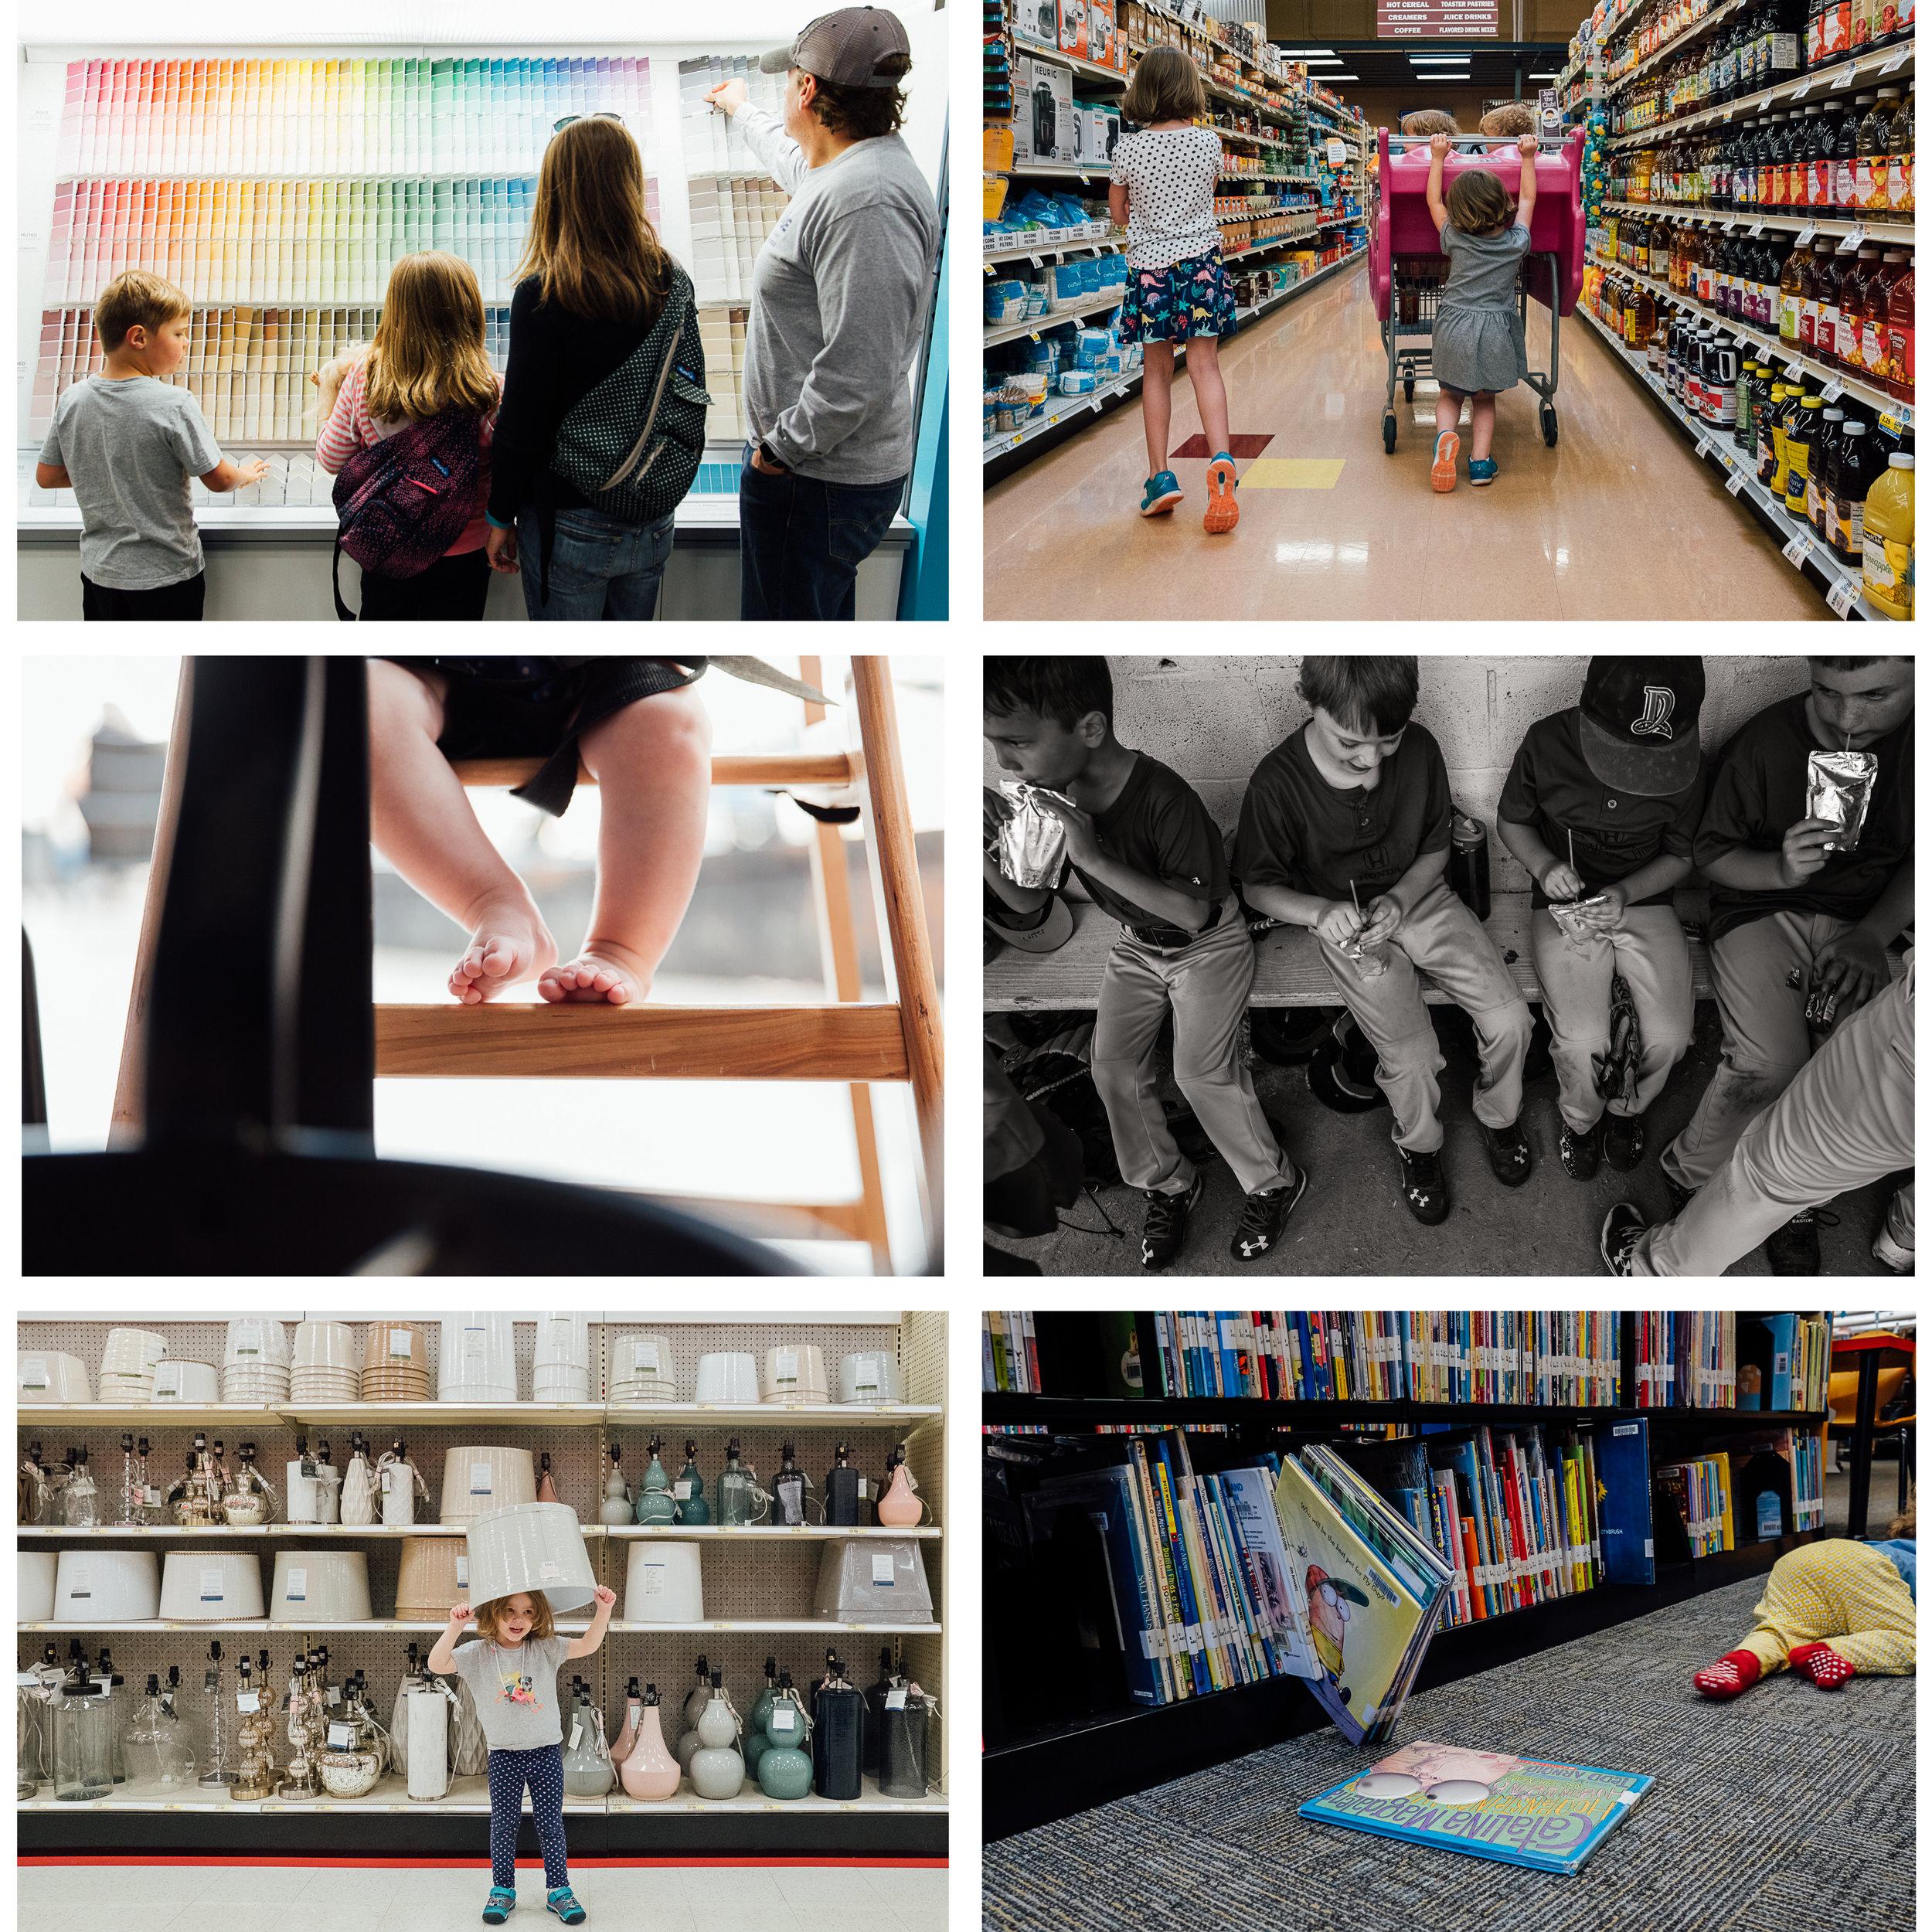 Out & About - Grocery shoppingLibraryHome improvement storeFarmers MarketGarden center/nurseryTargetRestaurantMusic/Art lessonsSports/Ballet/Tae Kwon DoHair salon